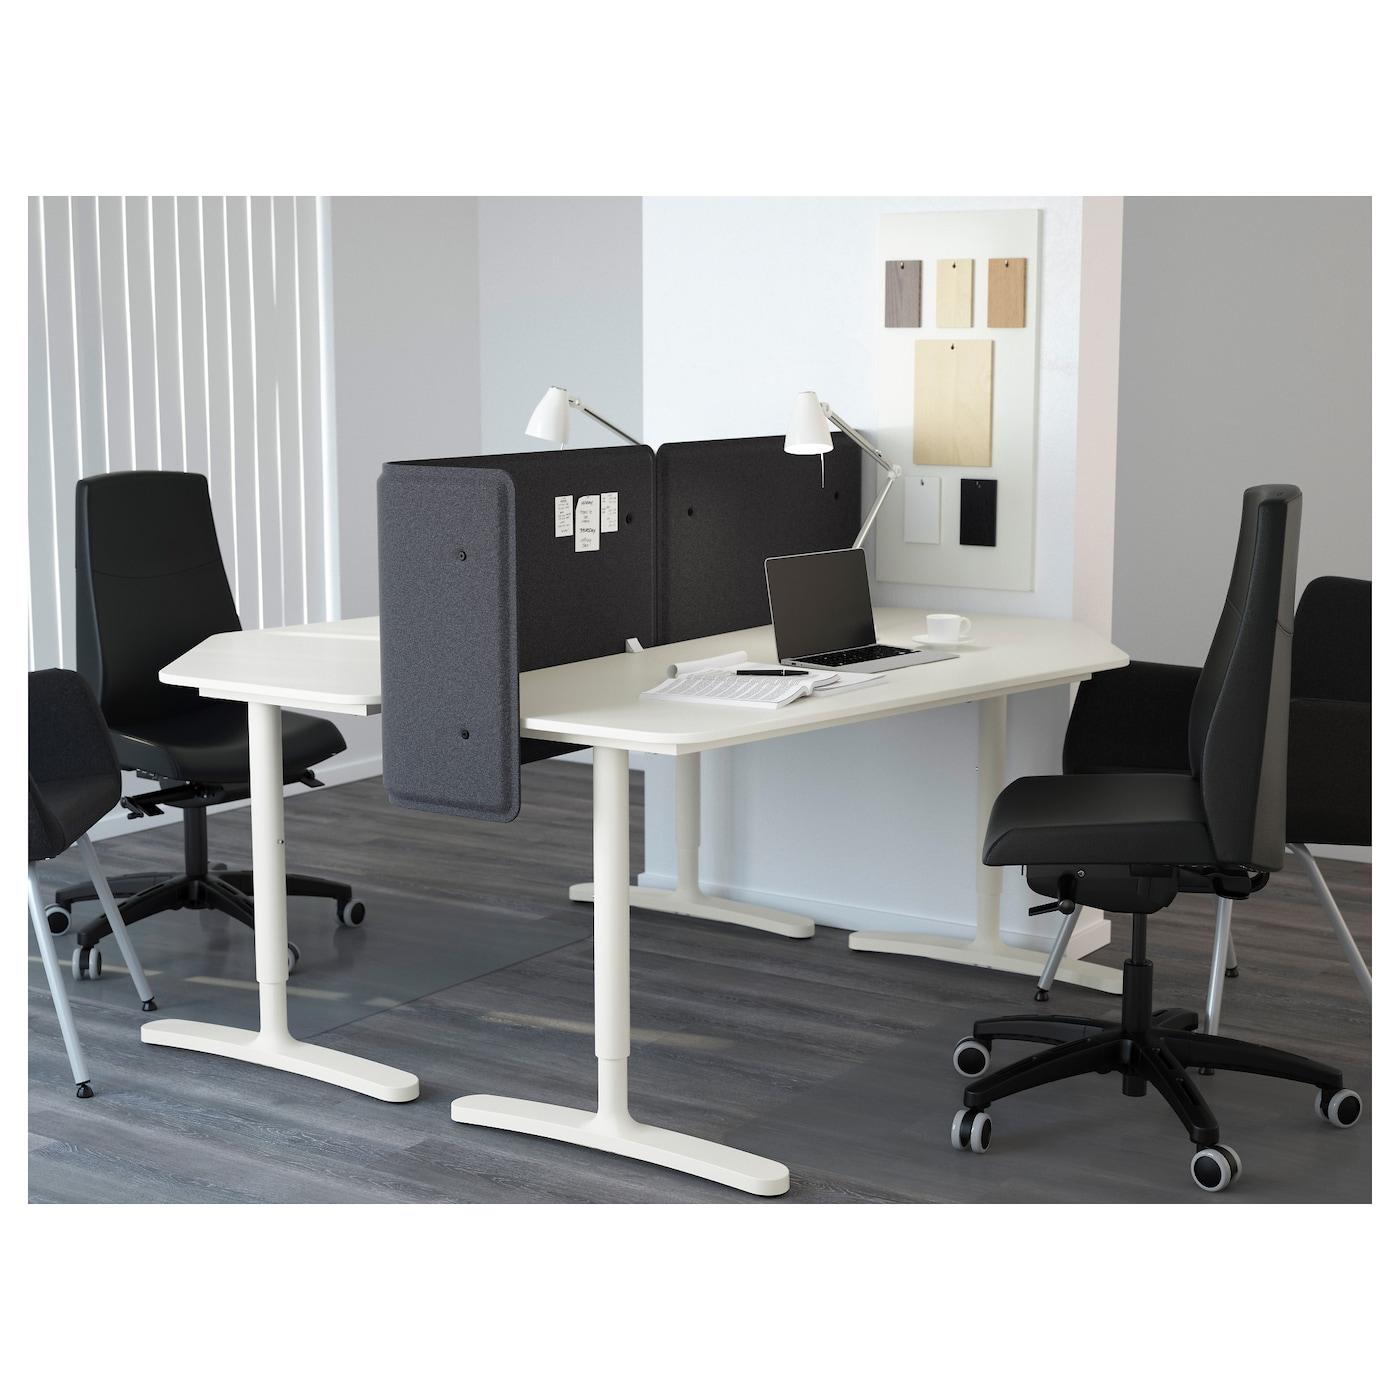 BEKANT Desk with screen White 160x160 55 cm IKEA